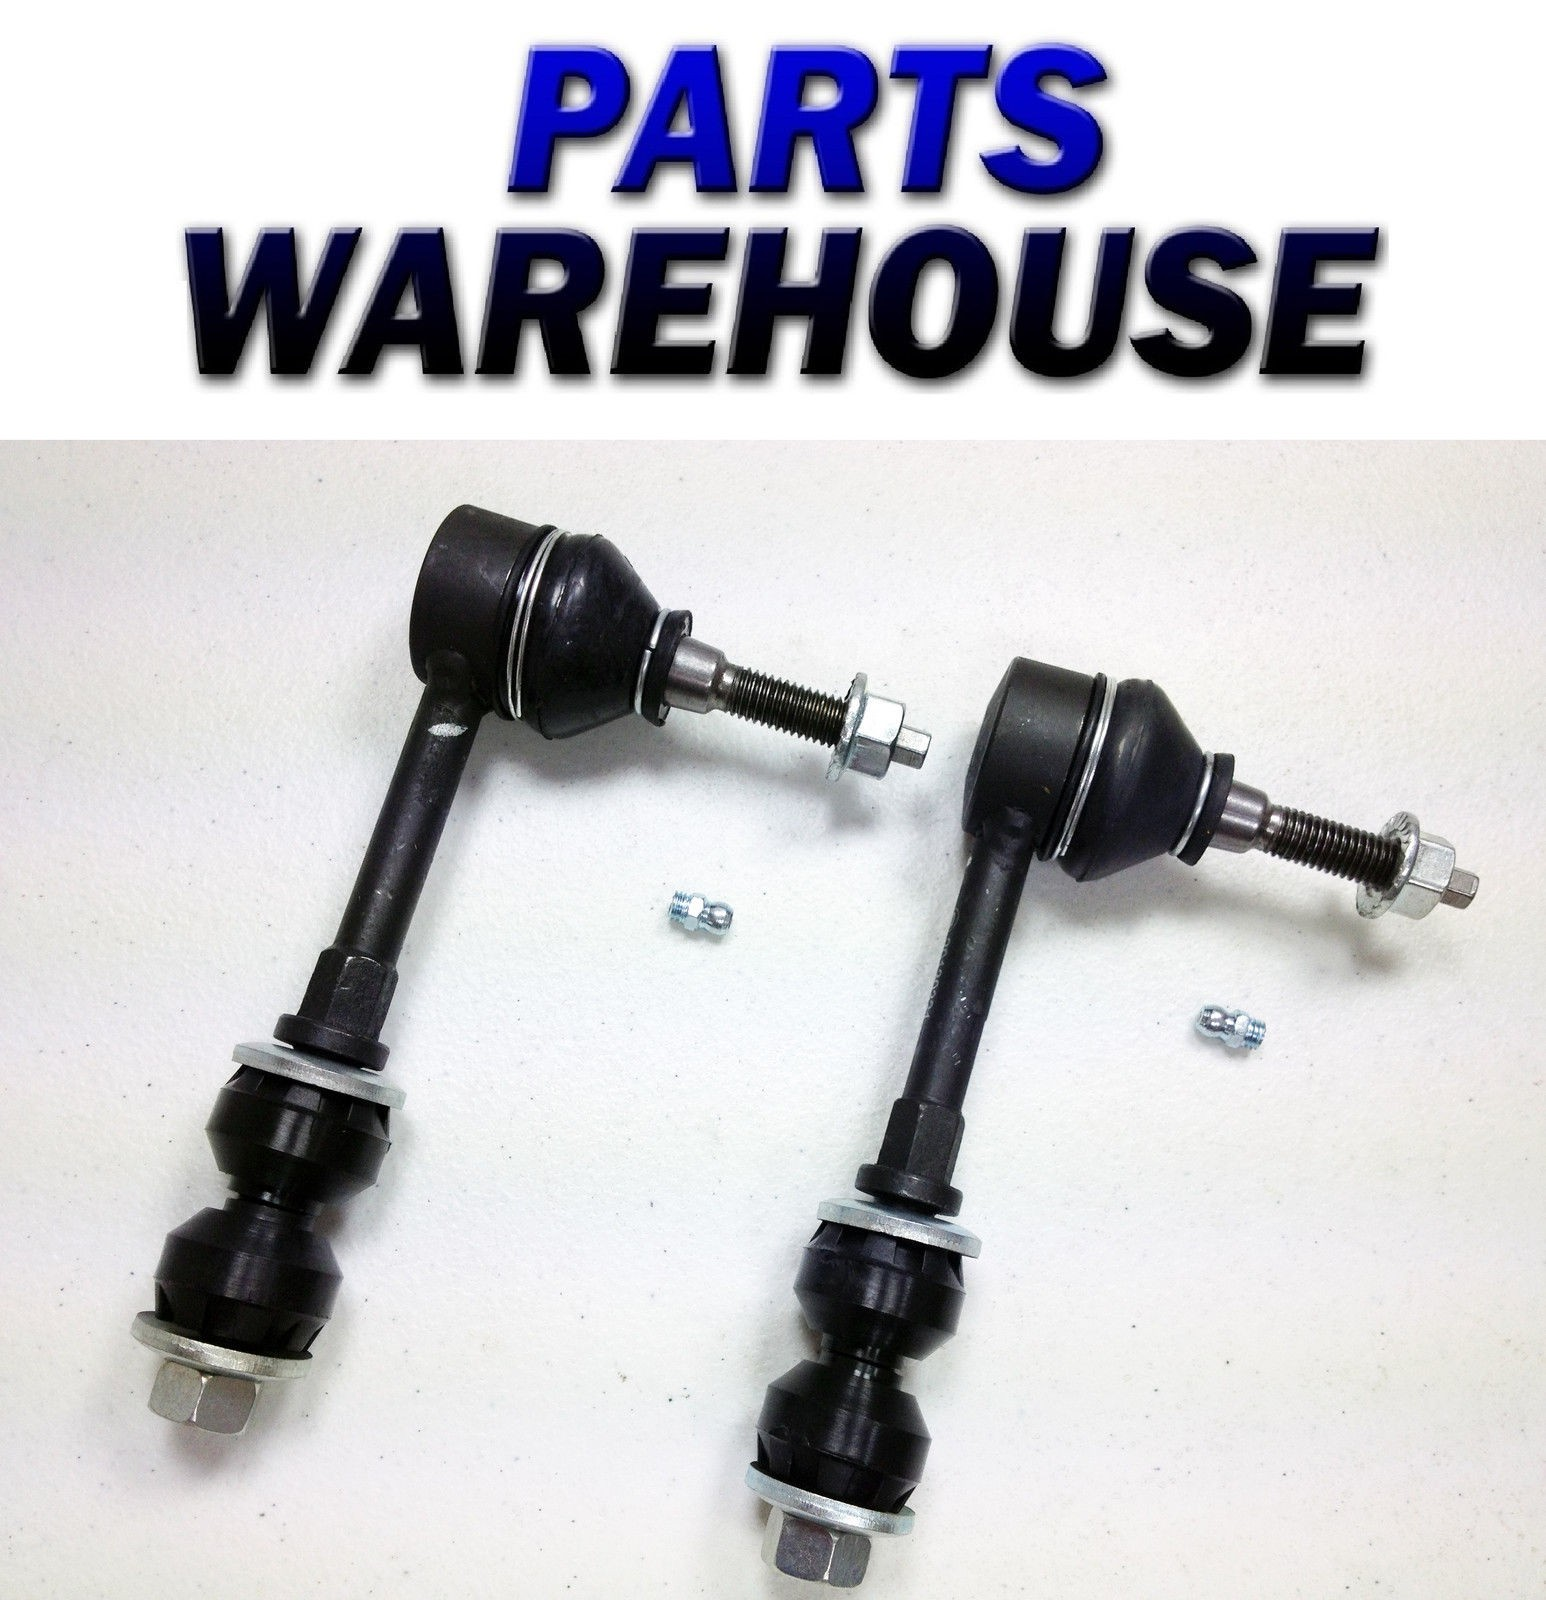 2 Front Stabilizer Sway Bar Links Dodge Ram 2500 3500 1 Year Warranty